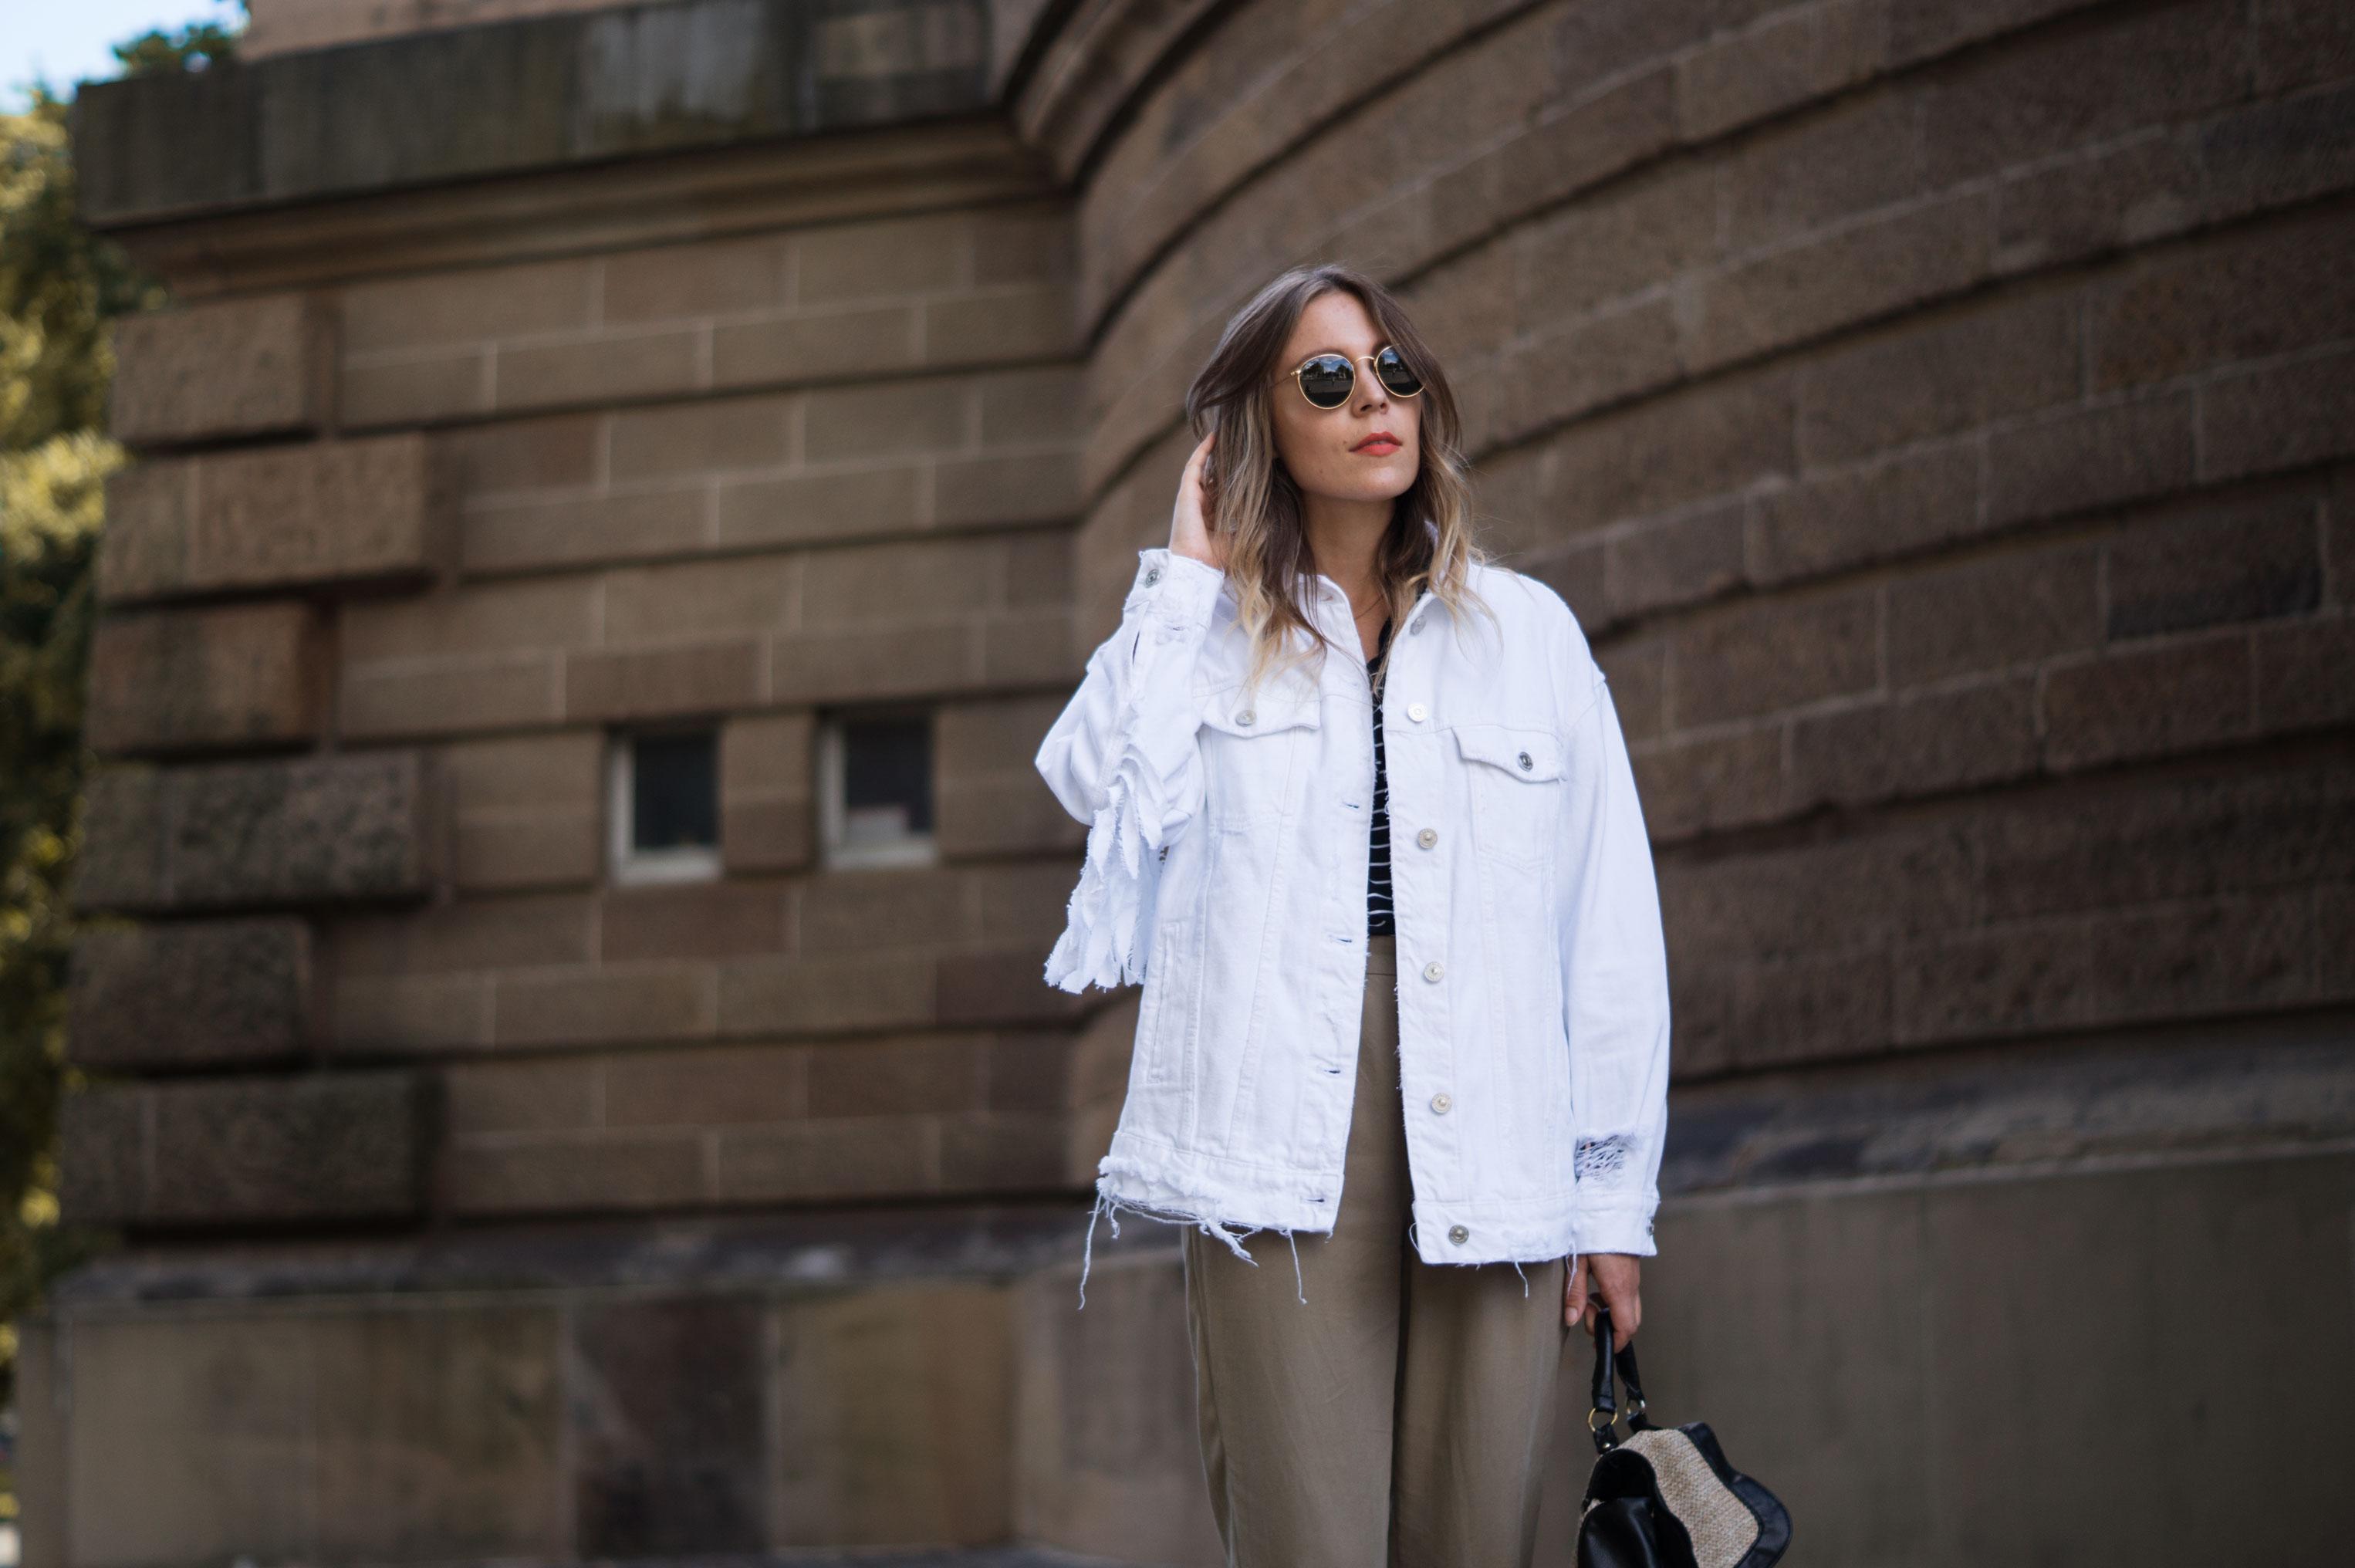 Fringed Denim Jacket Fransenjacke weiße Jeansjacke Casual Outfit Sariety Fashionblogger Modeblog Heidelberg Mannheim Wasserturm-10